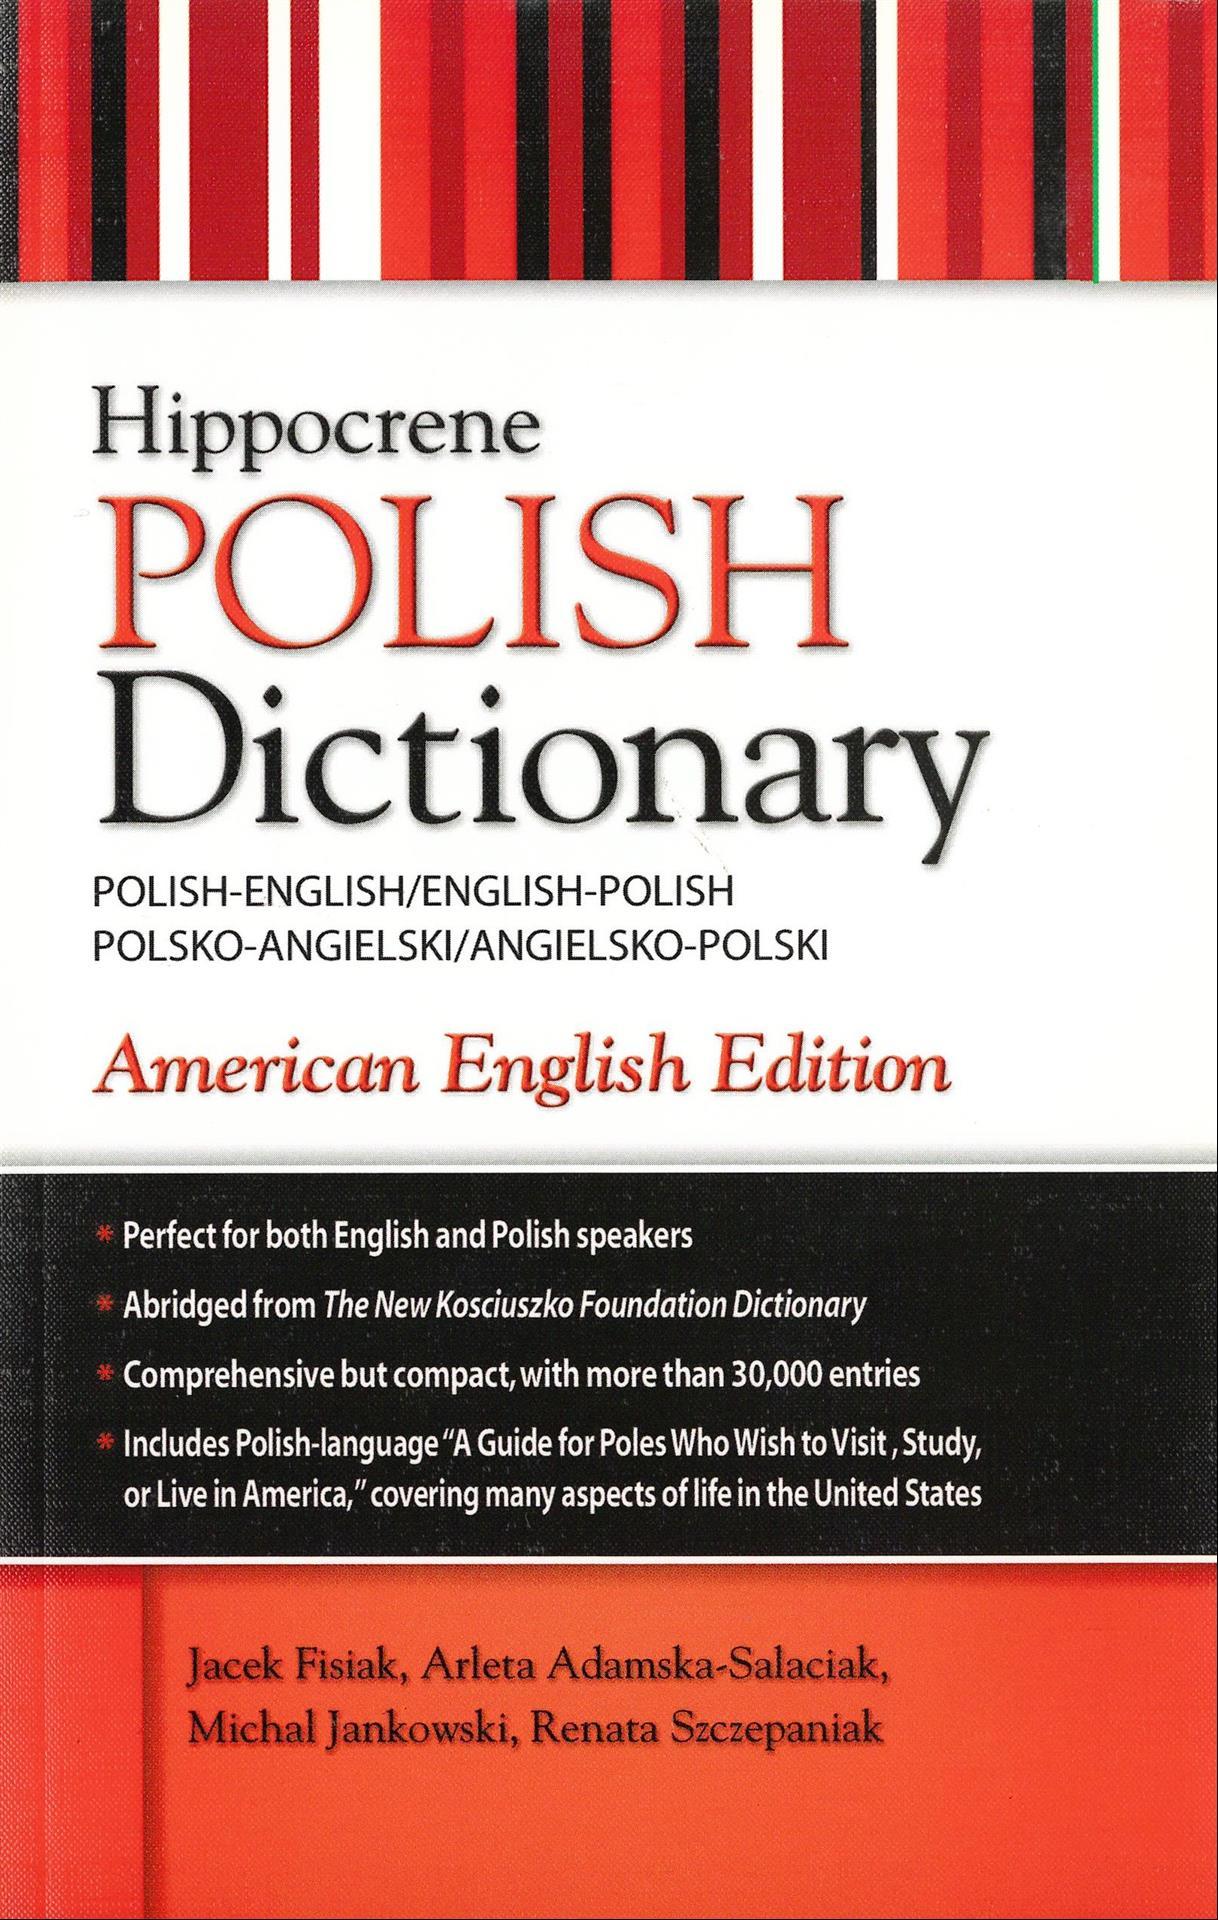 POLISH-ENGLISH/ENGLISH-POLISH DICTIONARY